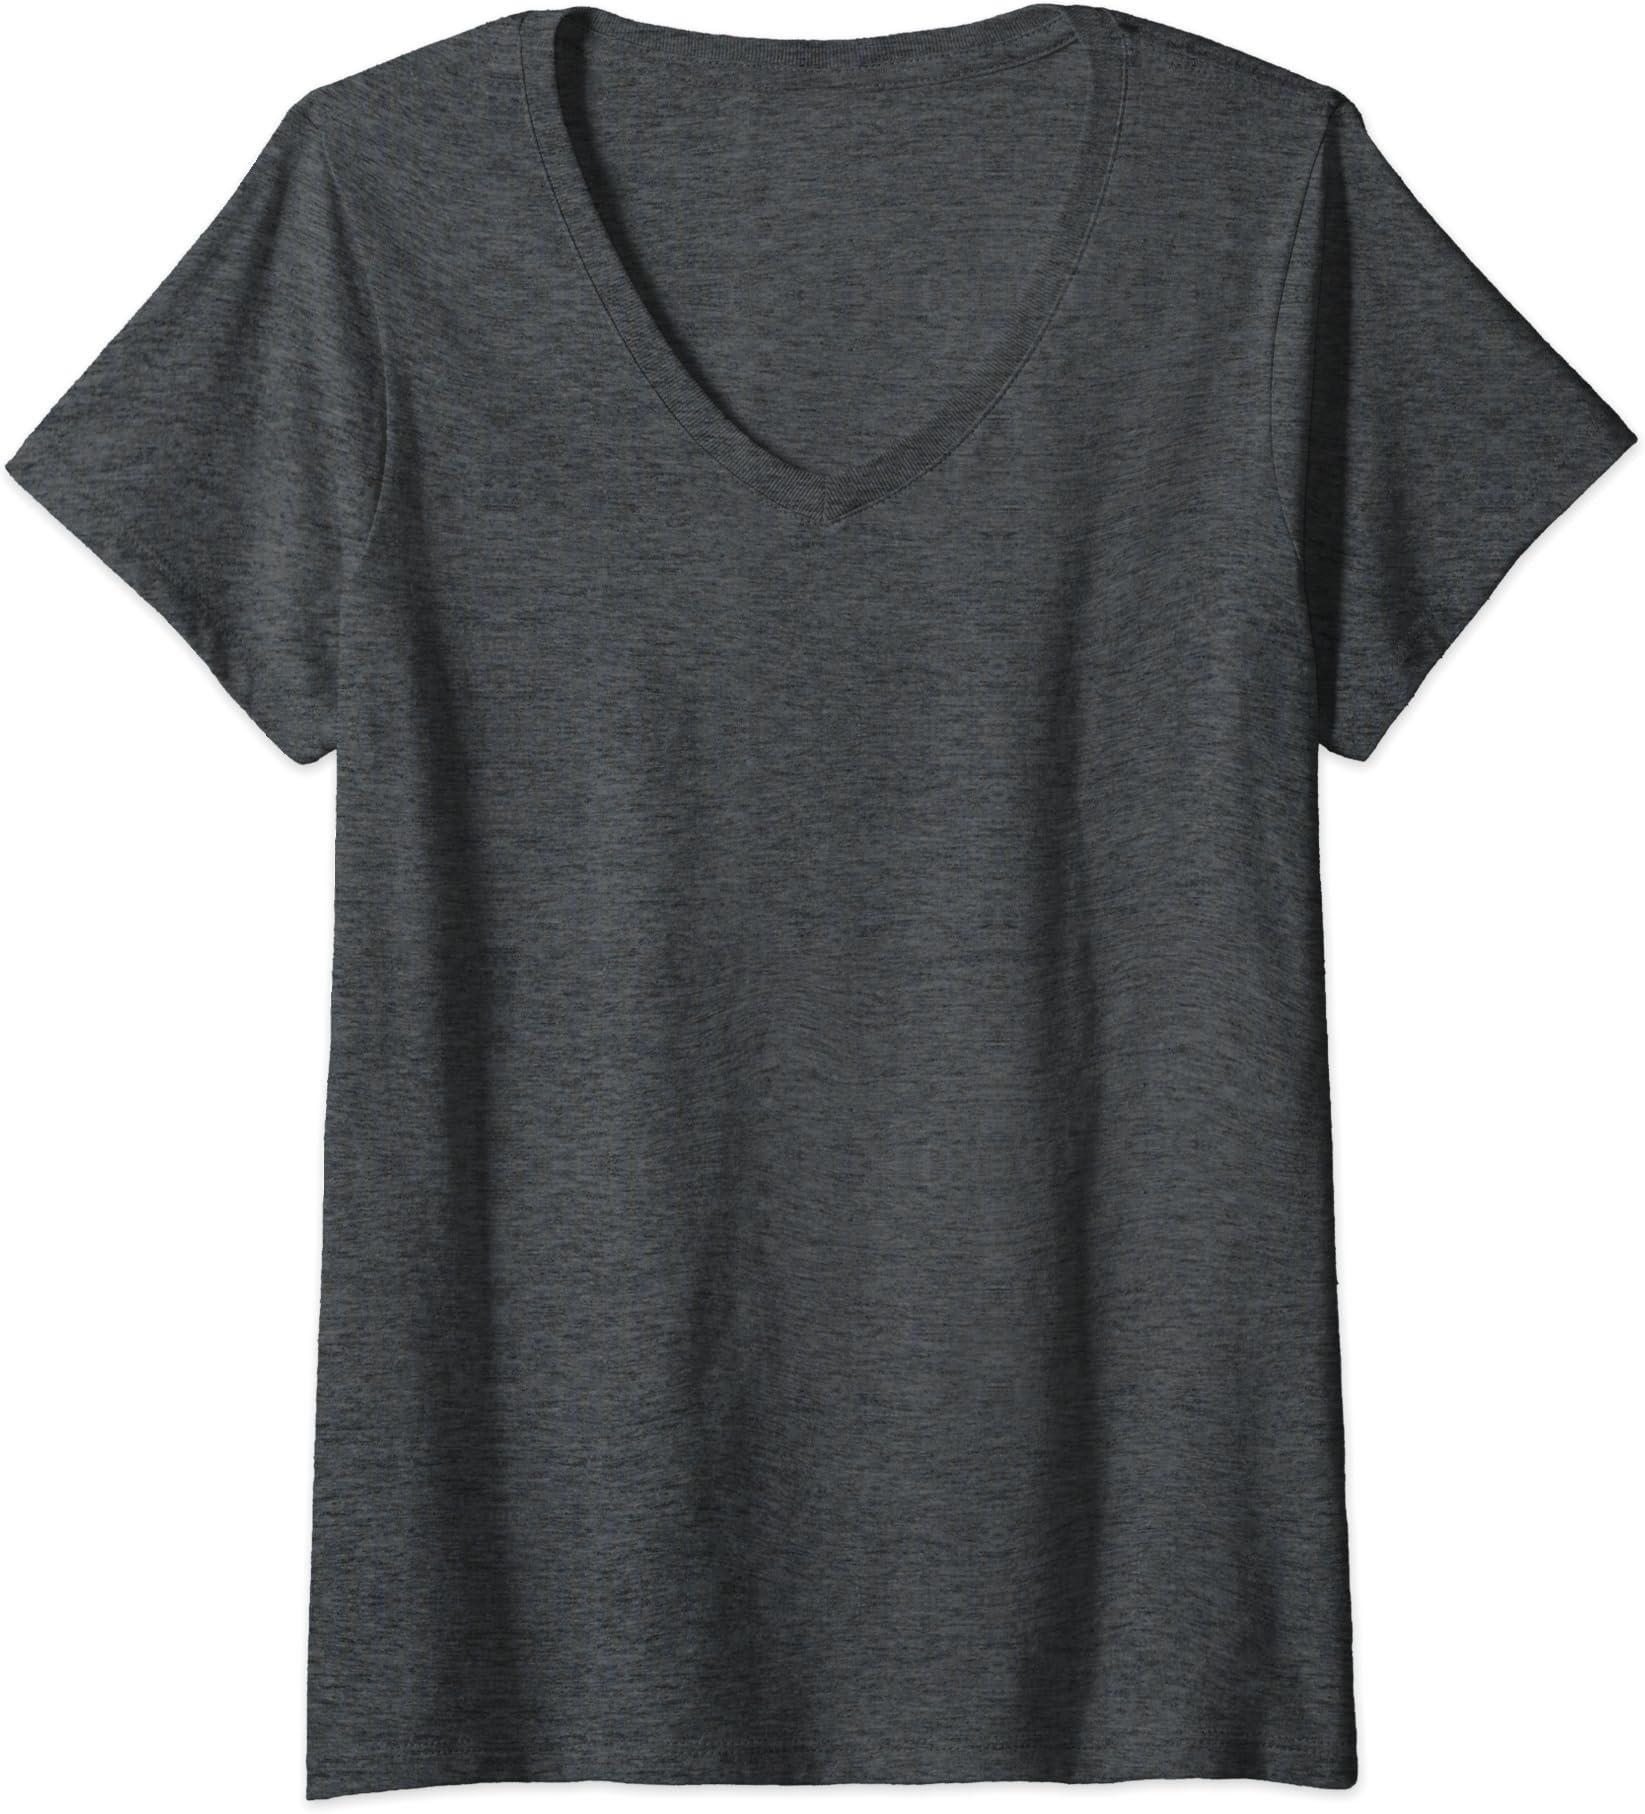 Black T-Shirt Men Short Sleeve Graphic Tee O Neck Cotton Bat Forest Dark Night